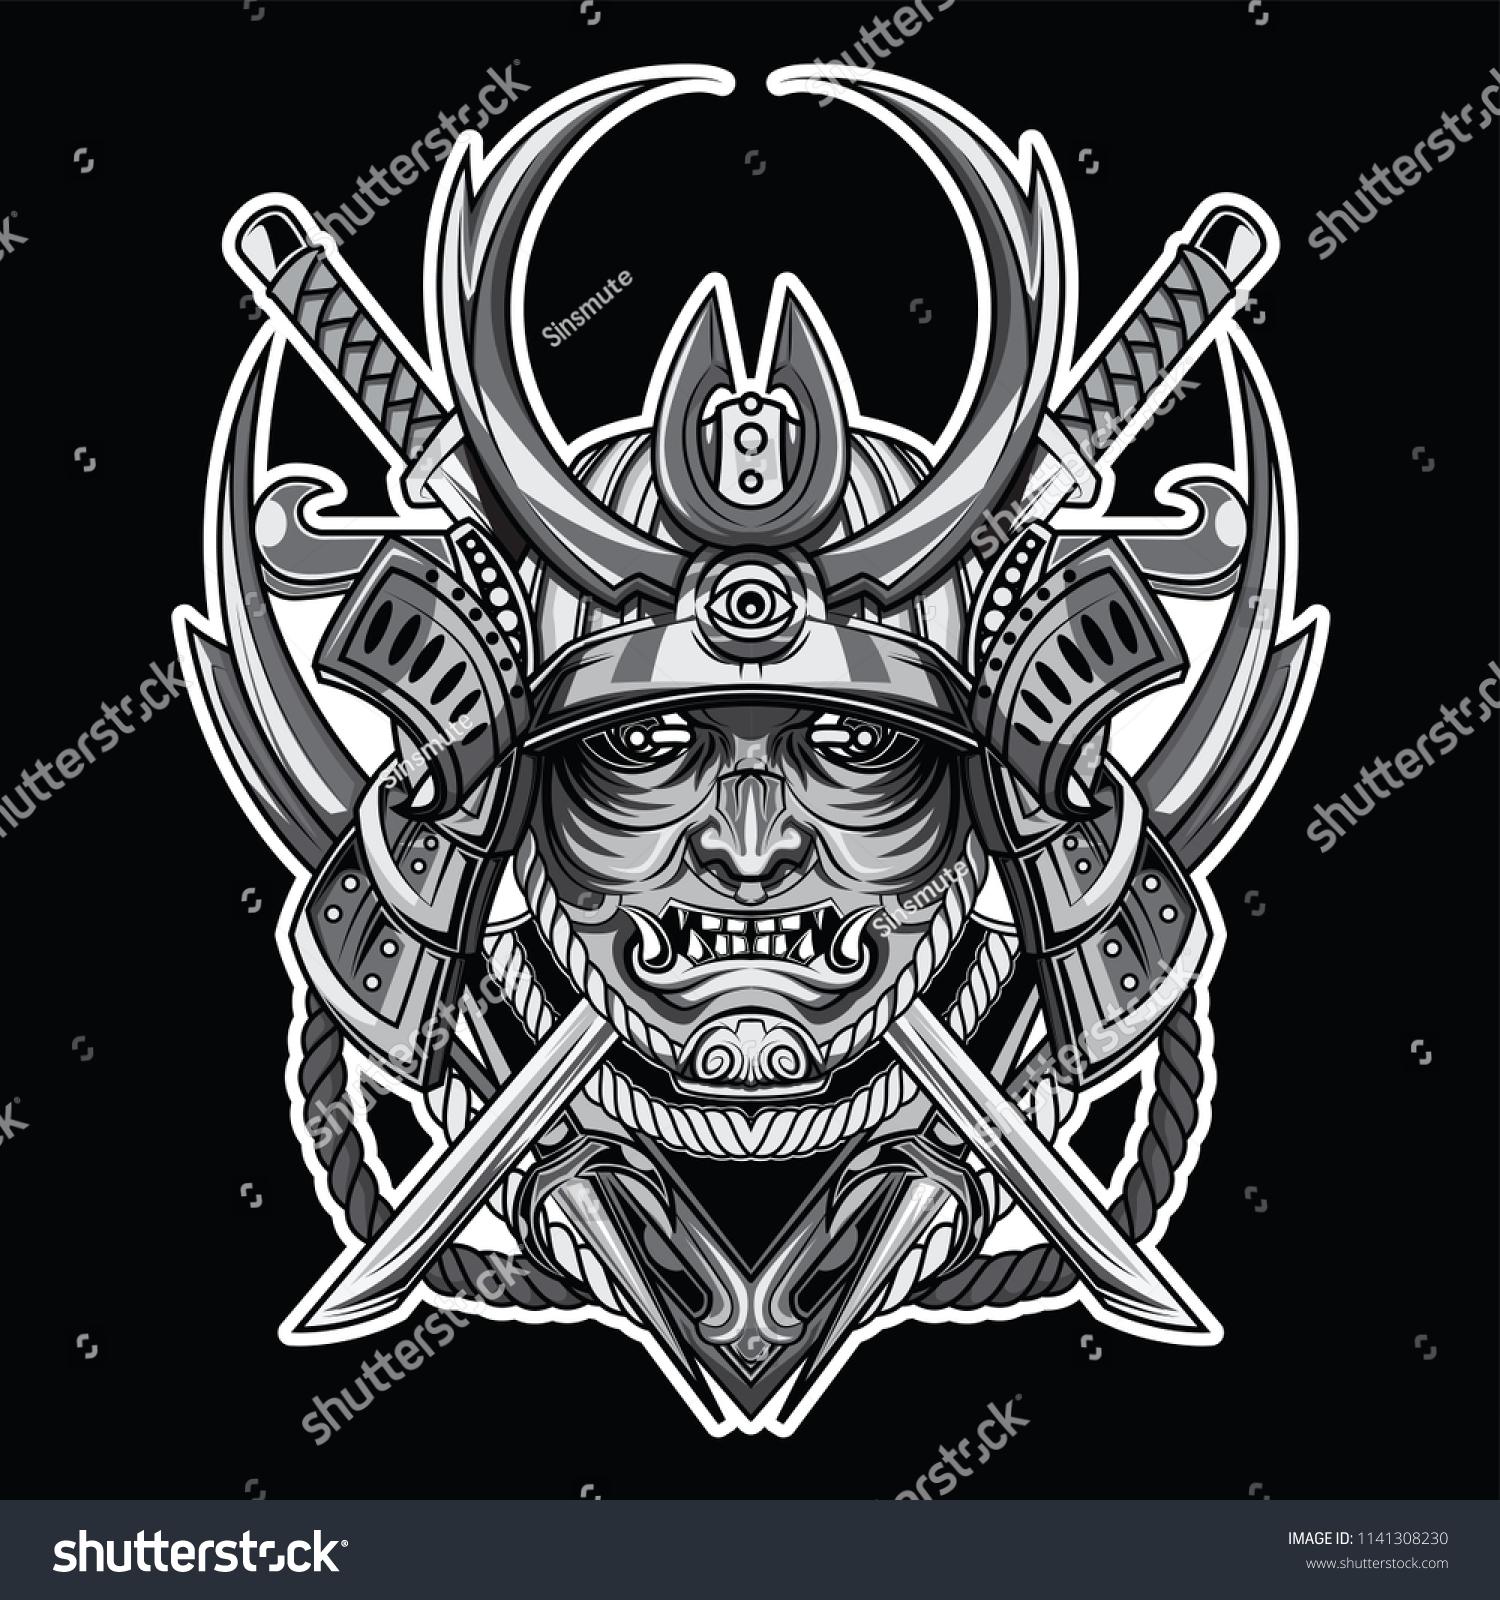 Silver Samurai Mask Tattoo Concept Stock Vector Royalty Free 1141308230